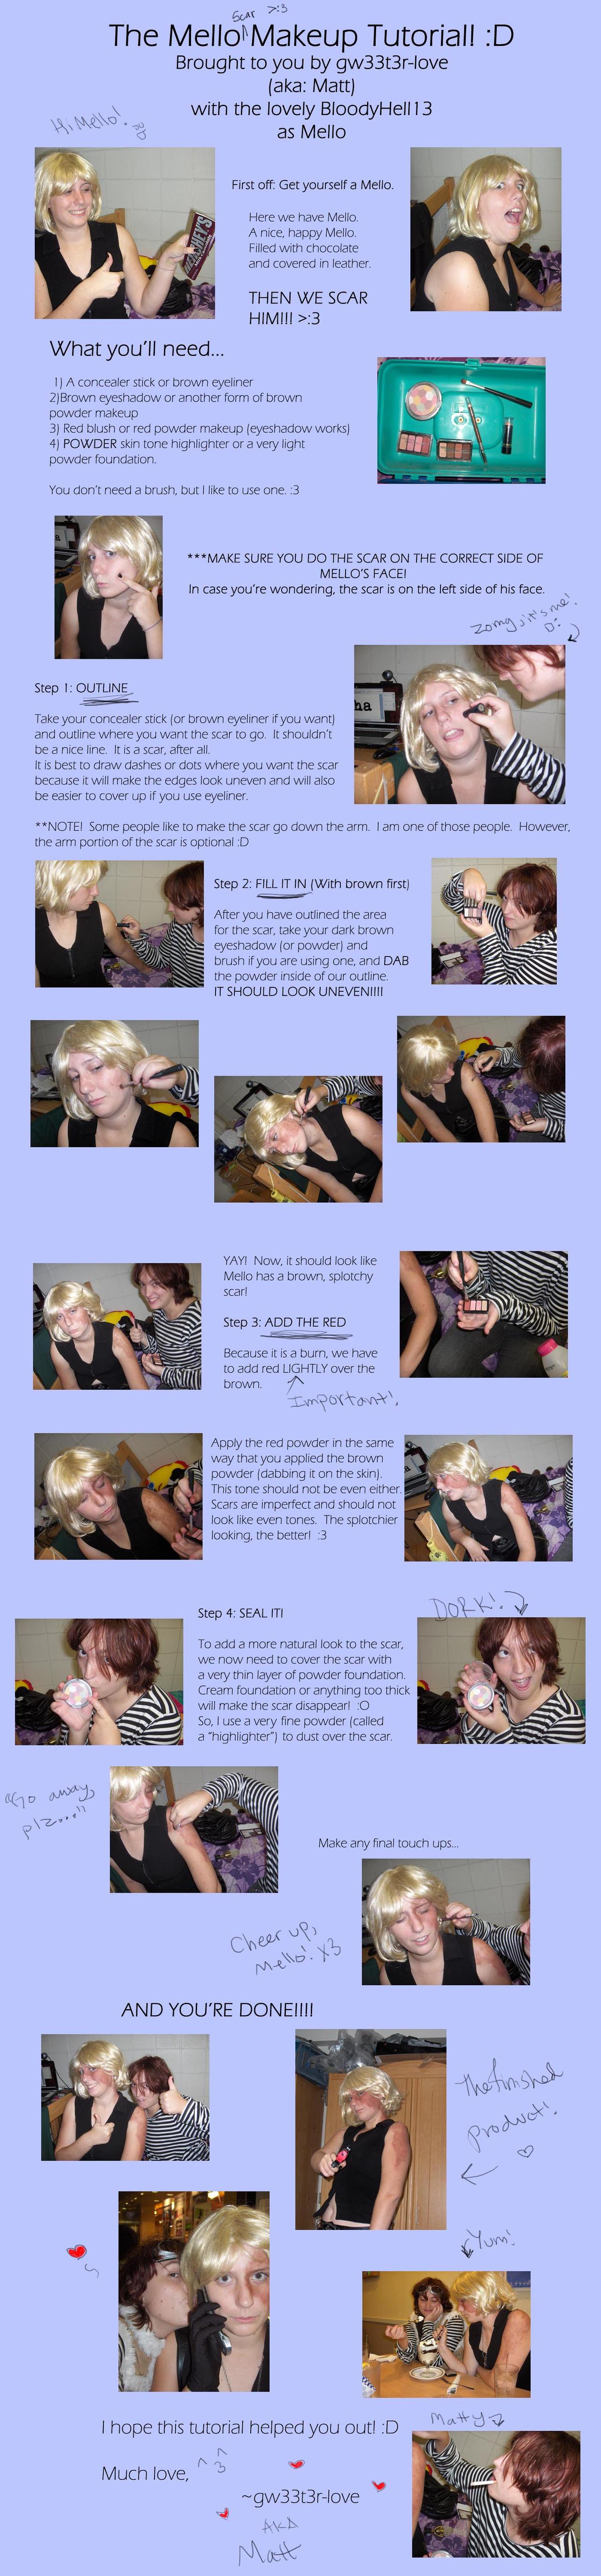 Mello Scar Makeup Tutorial by gw33t3r-love